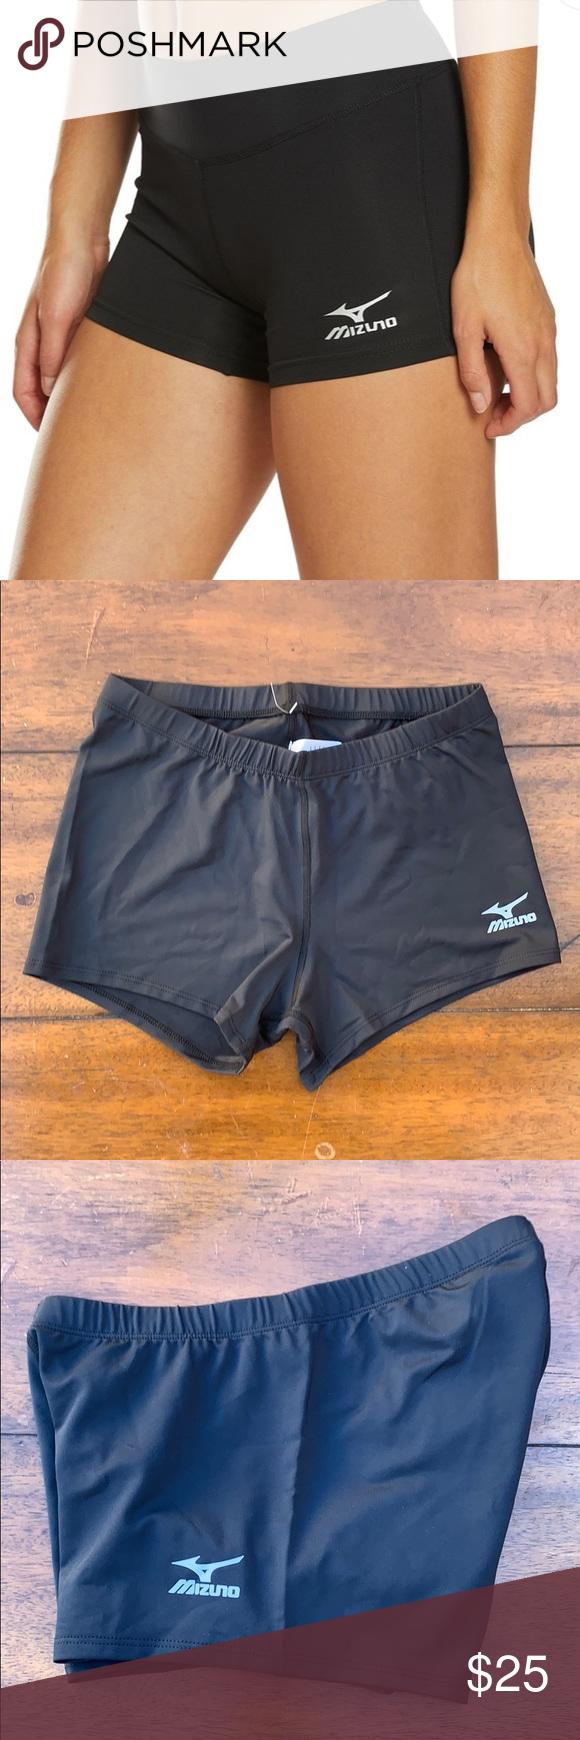 Mizuno Women S Volleyball Shorts Size M New With Tag Excellent Condition Mizu Condition Excellent Mizu Mizuno Shorts In 2020 Volleyball Shorts Women Mizuno